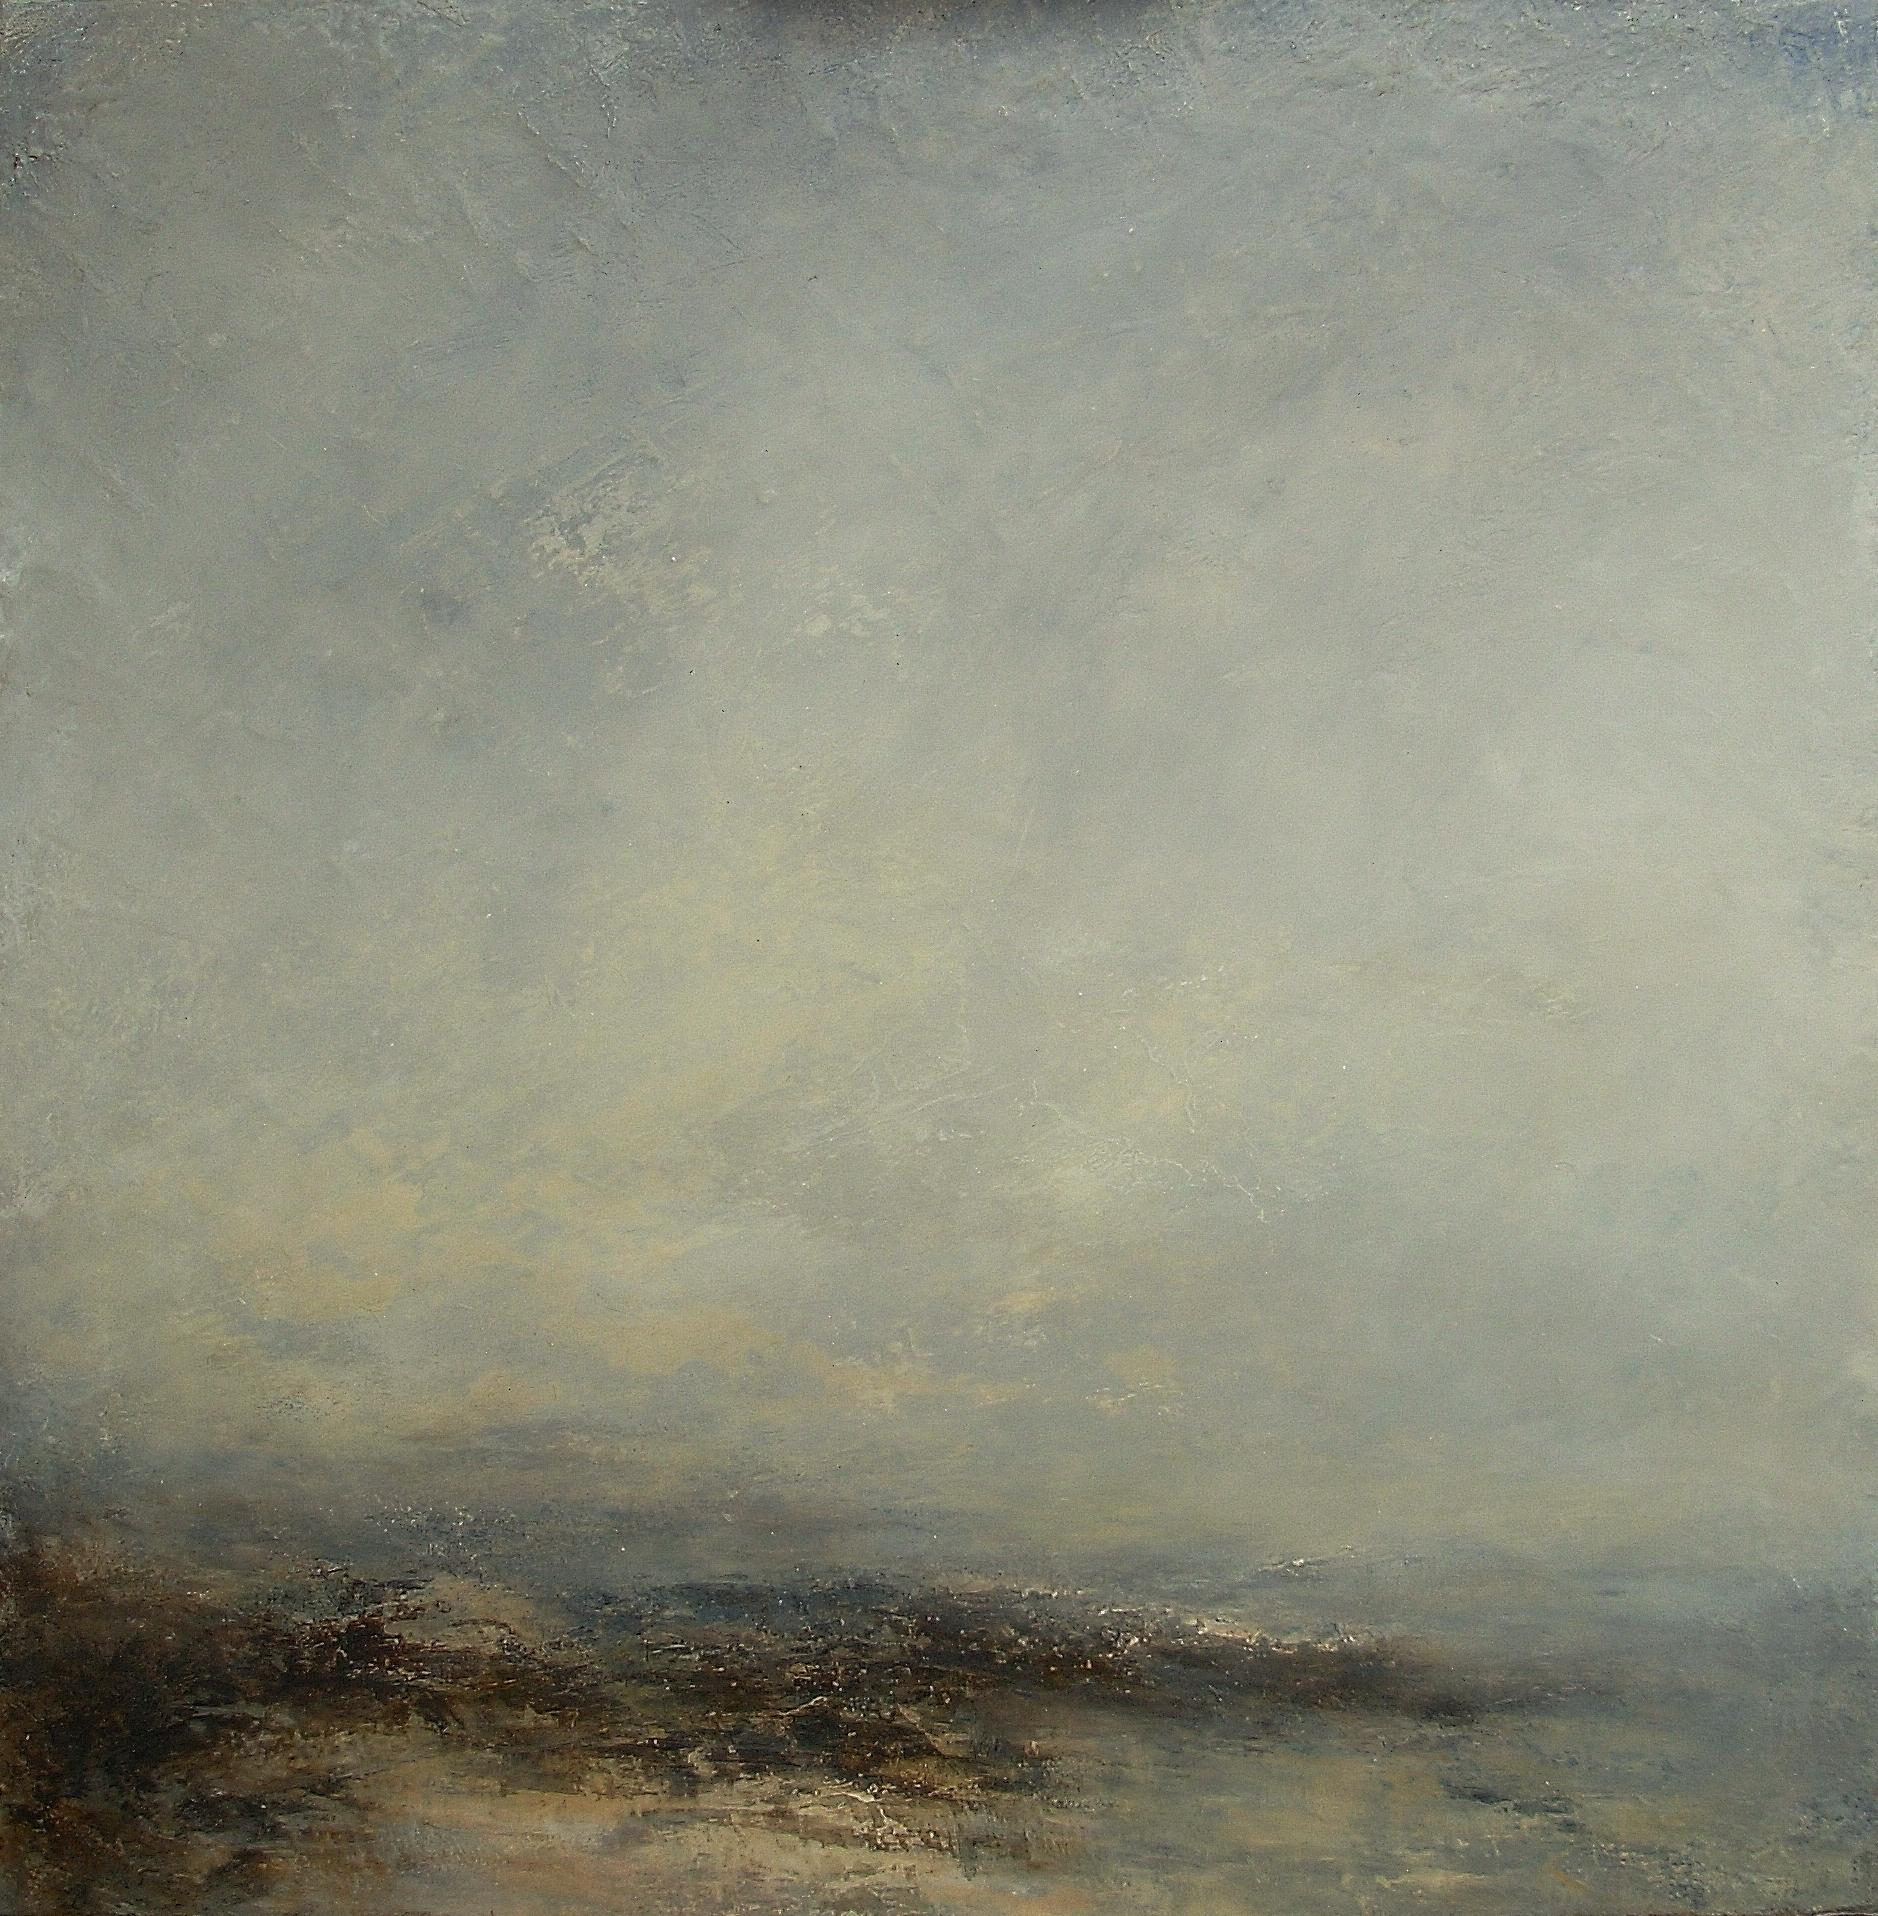 Graham S Davis - Washland